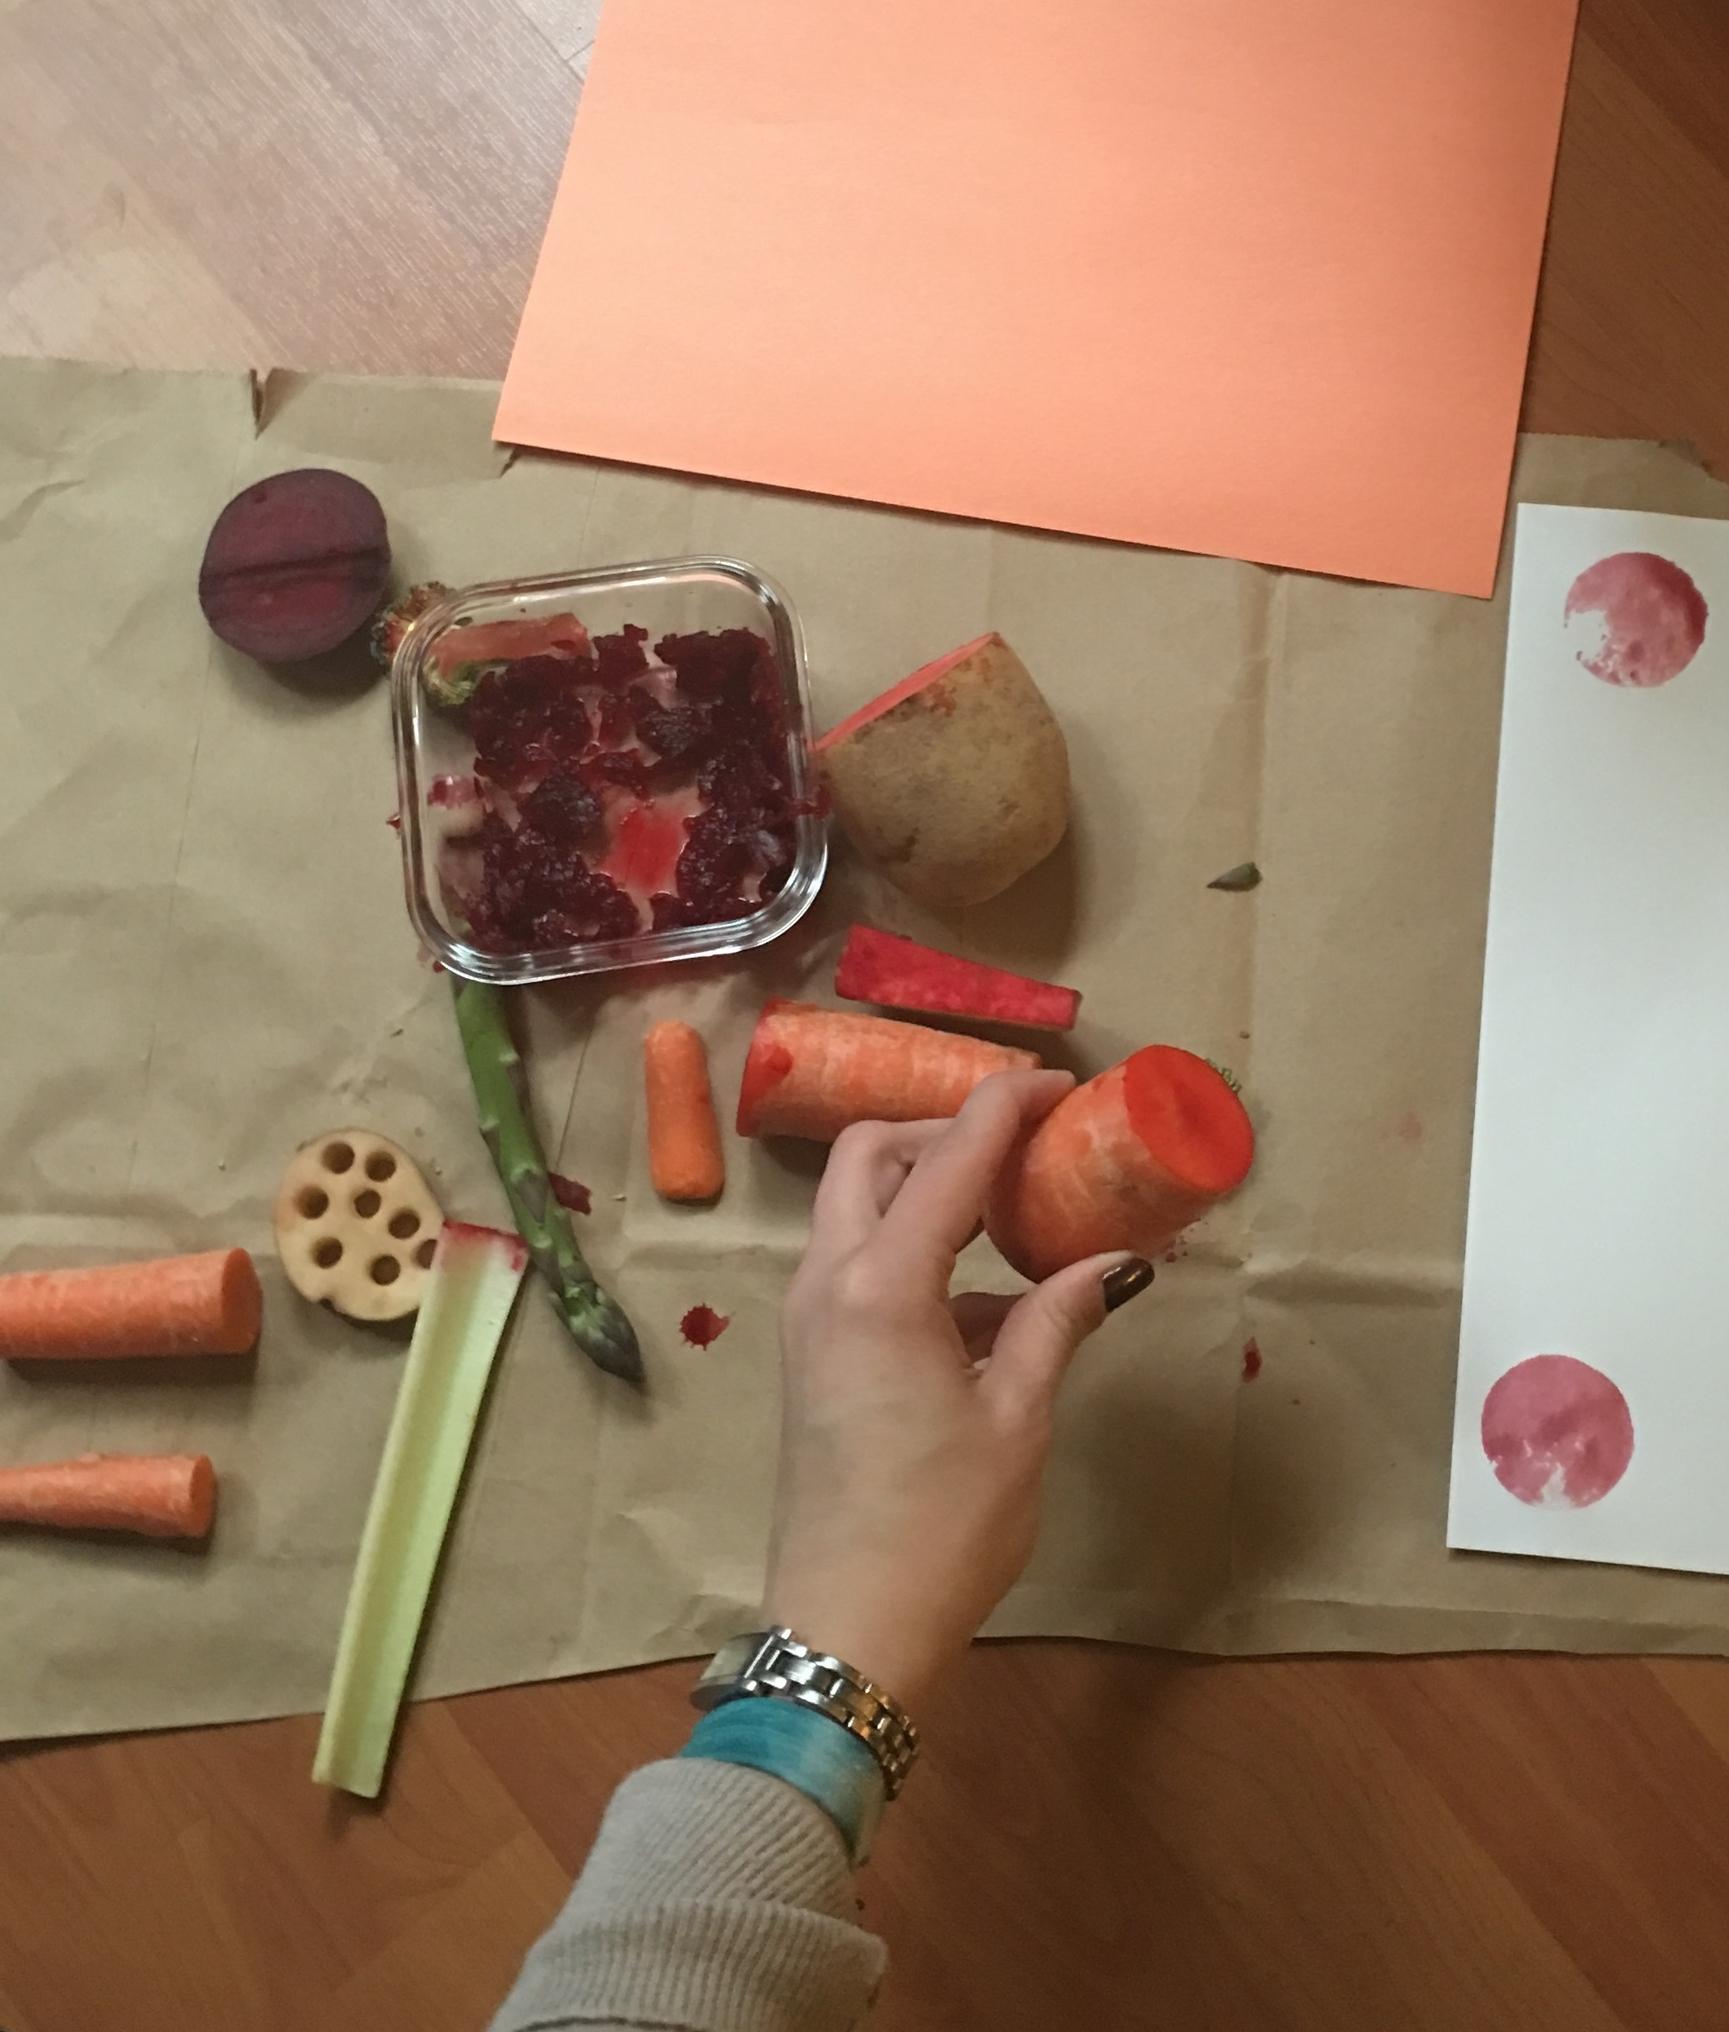 tonic-juicery-carbondale-colorado-crafts_0008.JPG